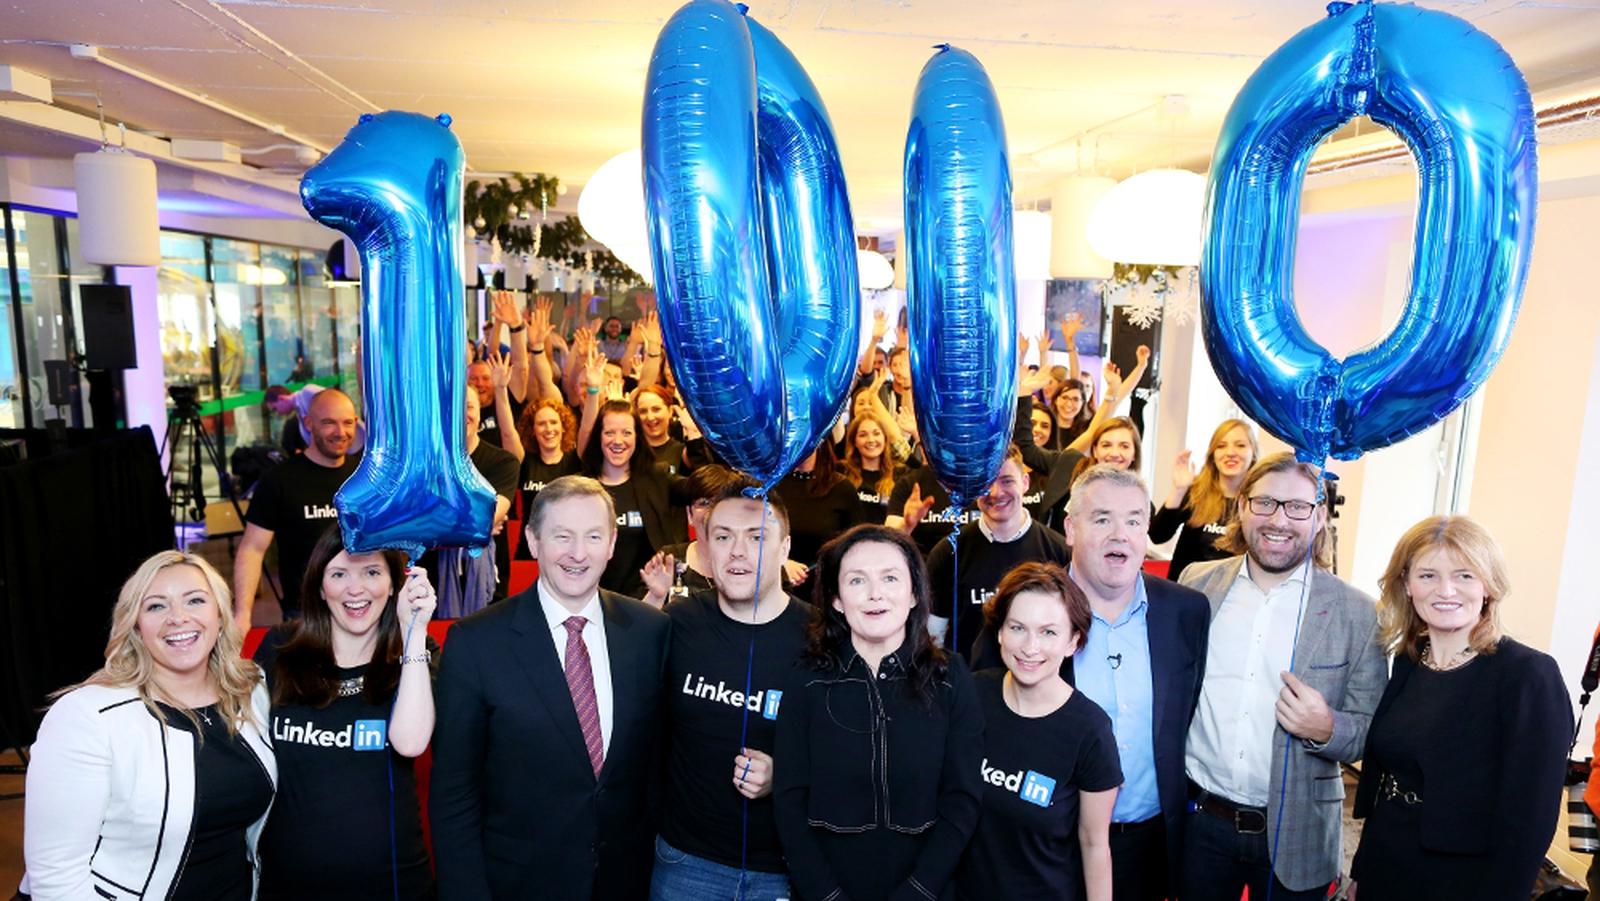 LinkedIn Set To Recruit 100 New Staff In Ireland